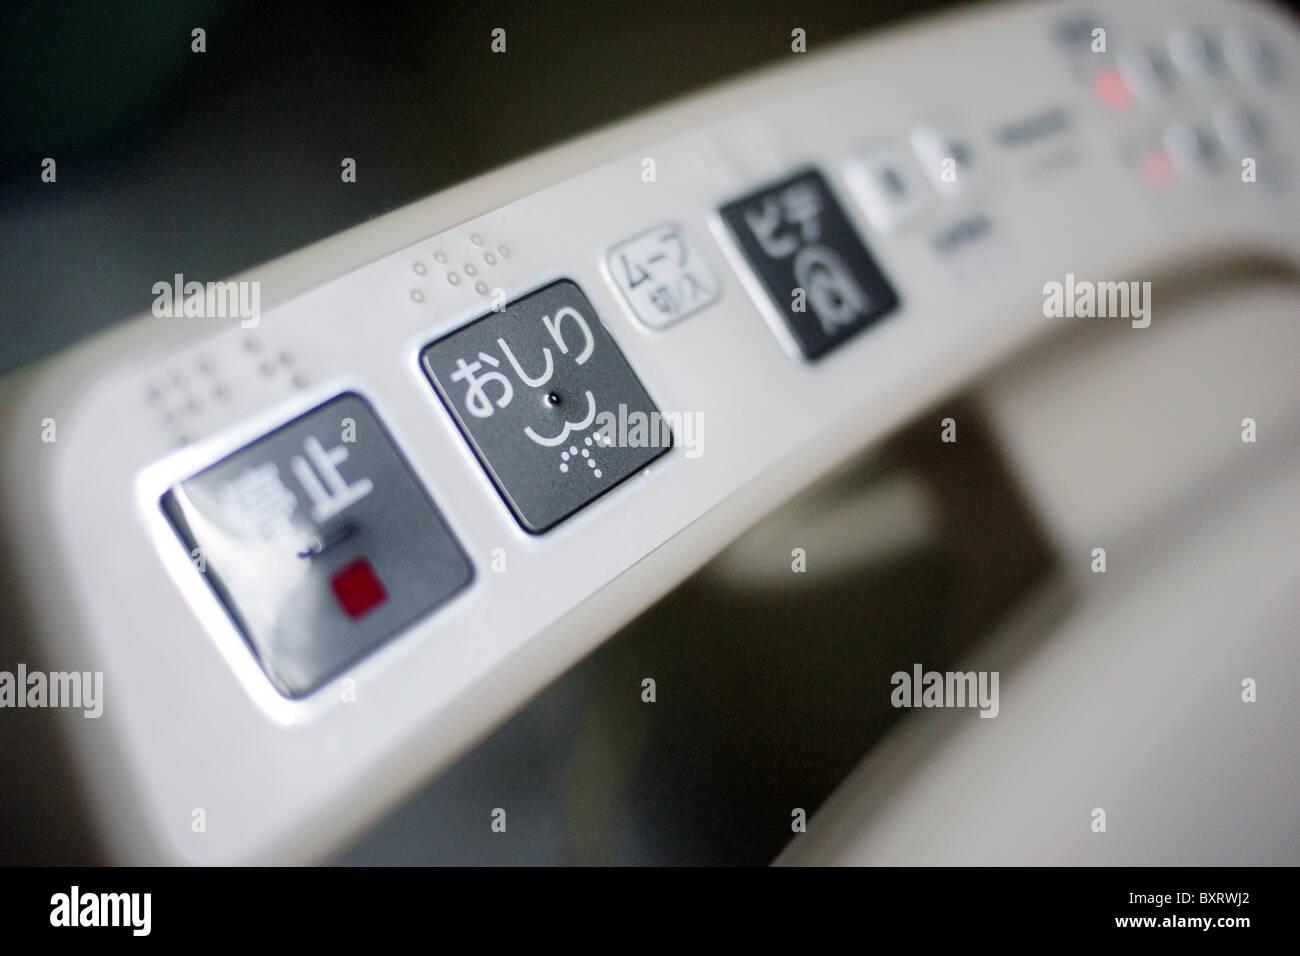 Hi-tech electrónicos modernos wc japonés en Japón Asia Imagen De Stock